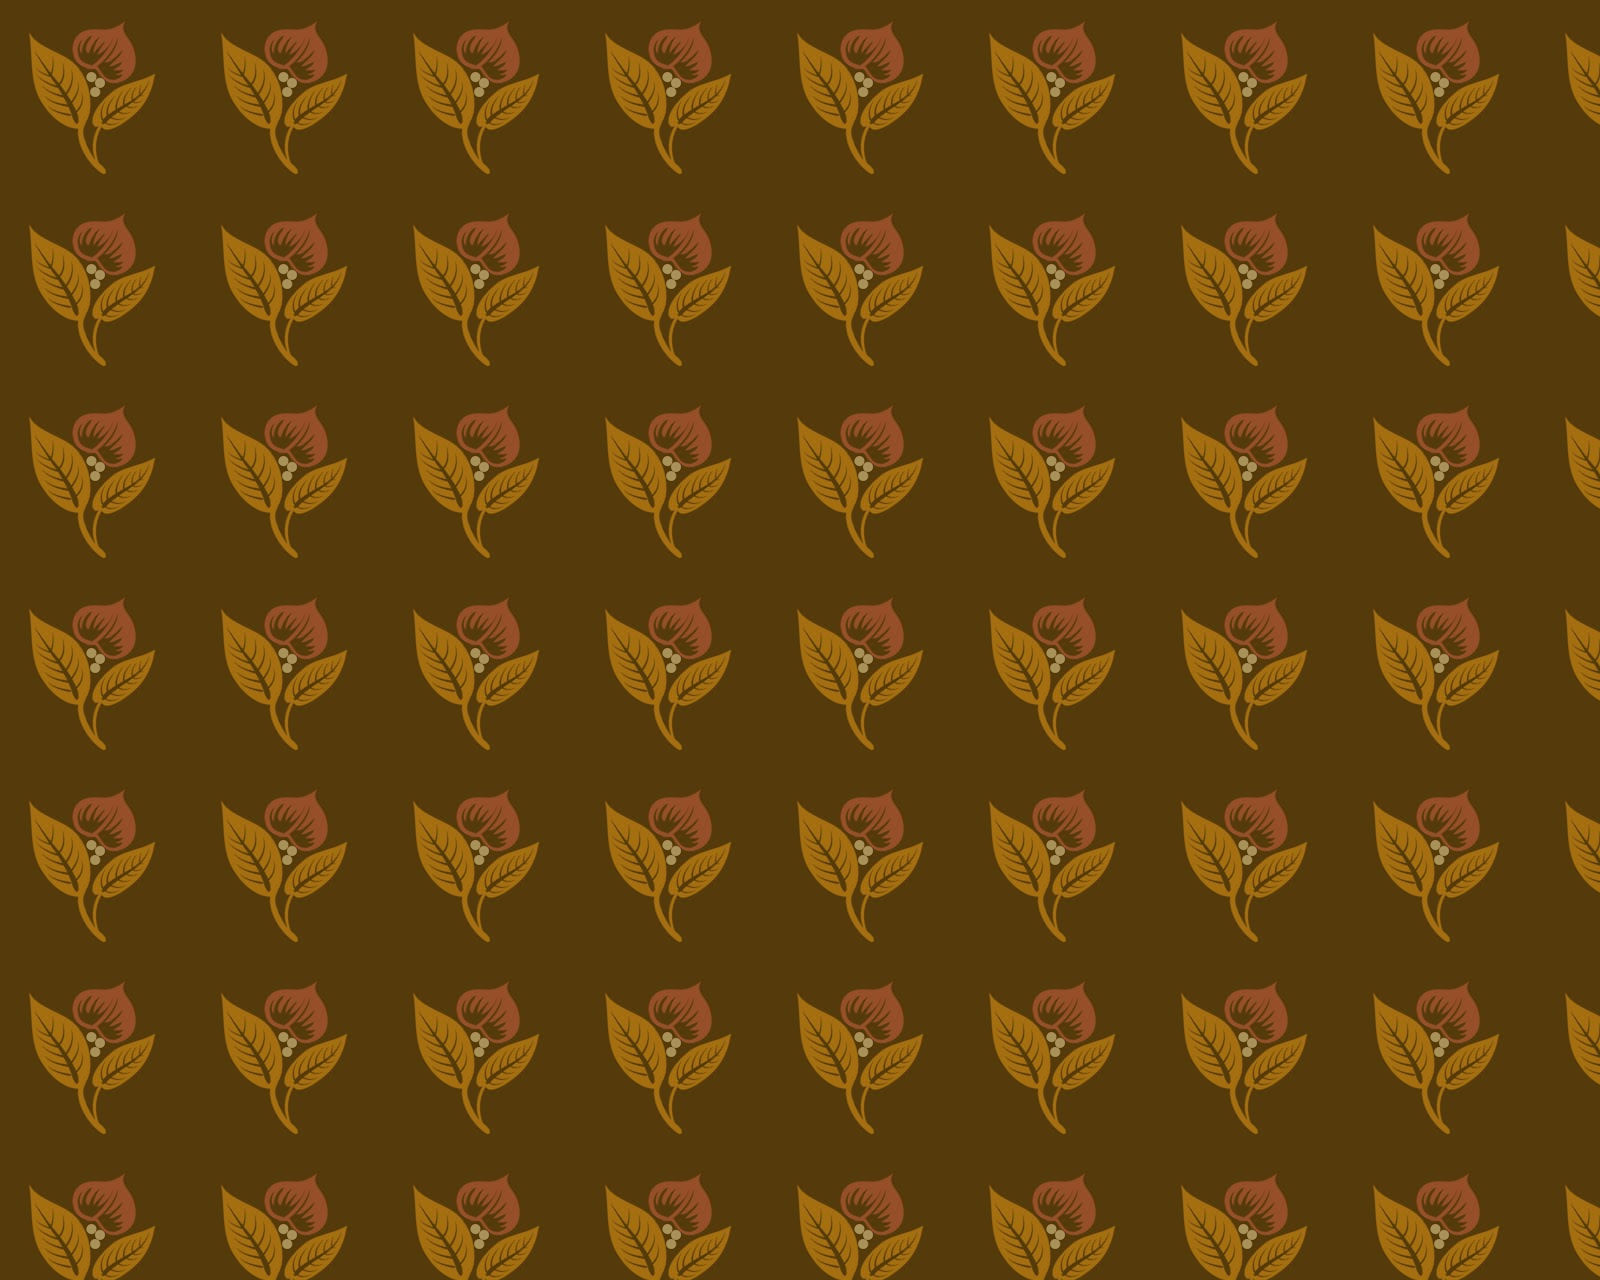 http://4.bp.blogspot.com/-phiJ257BHTI/UGw3akWLw9I/AAAAAAAAFuU/CR9MT_7H2ag/s1600/wallpaper+jill+19.jpg